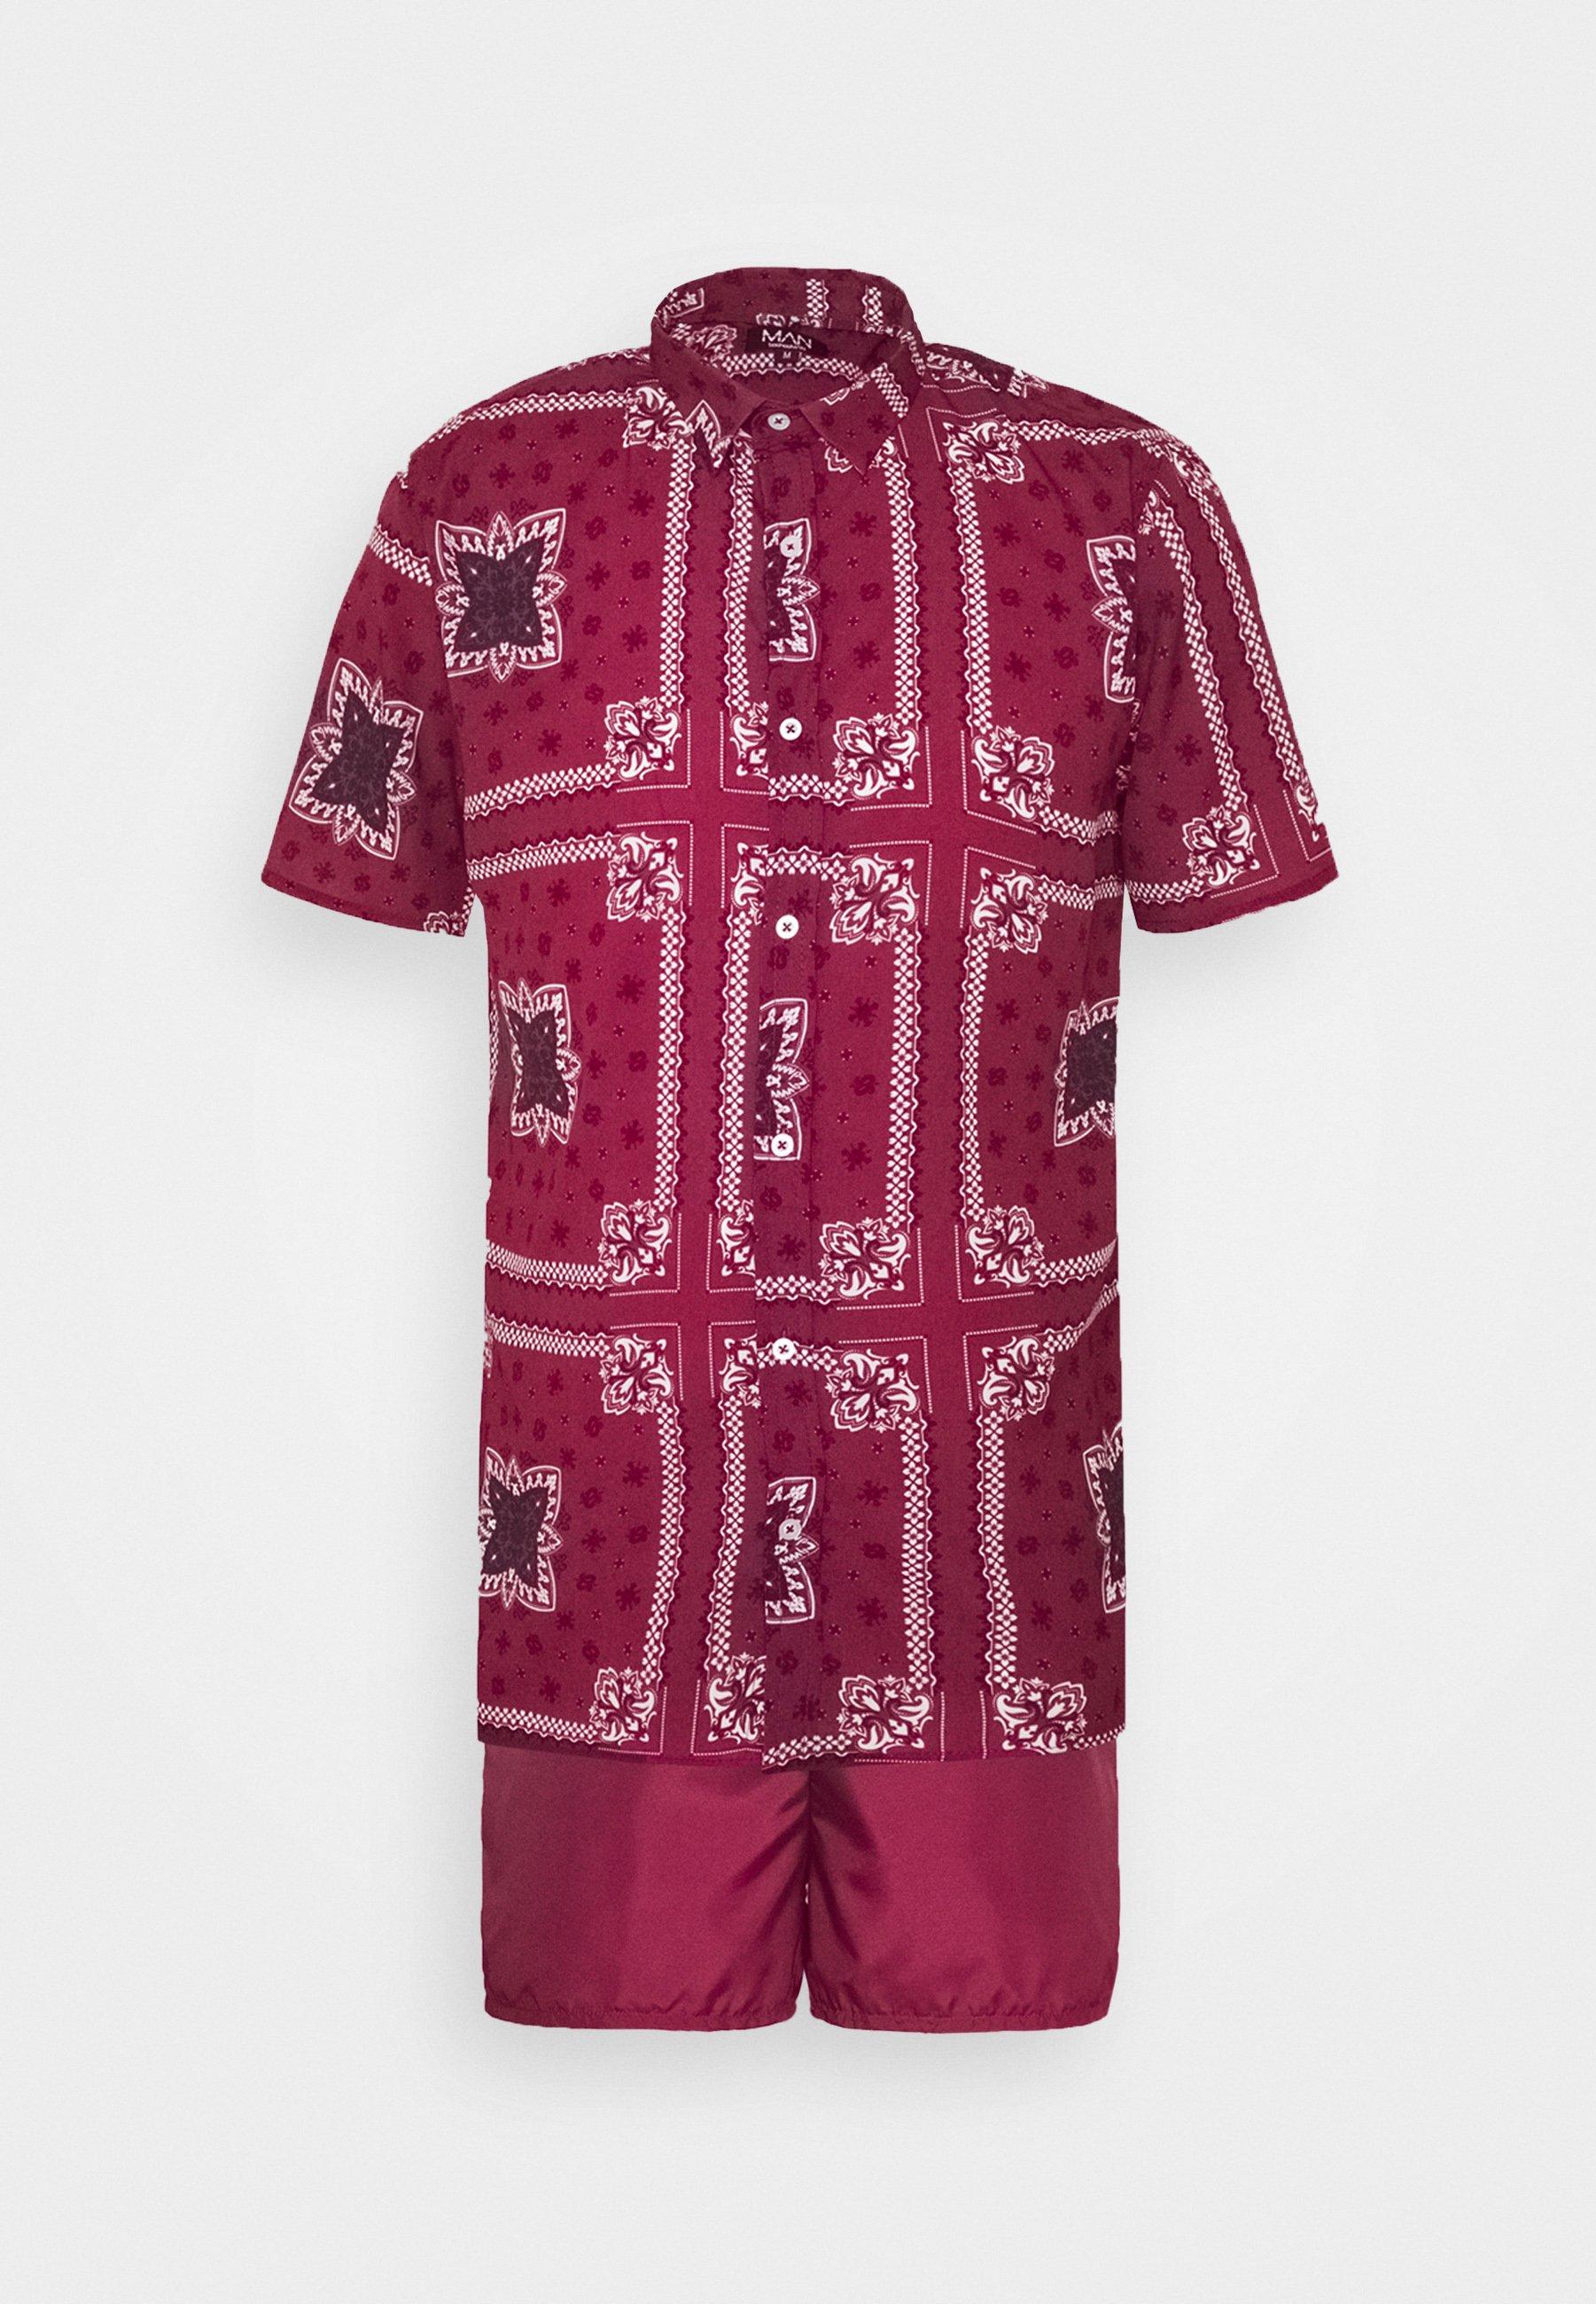 boohoo MAN SHORT SLEEVE SHIRT SET IN PAISLEY PRINT - Szorty kąpielowe - burgundy